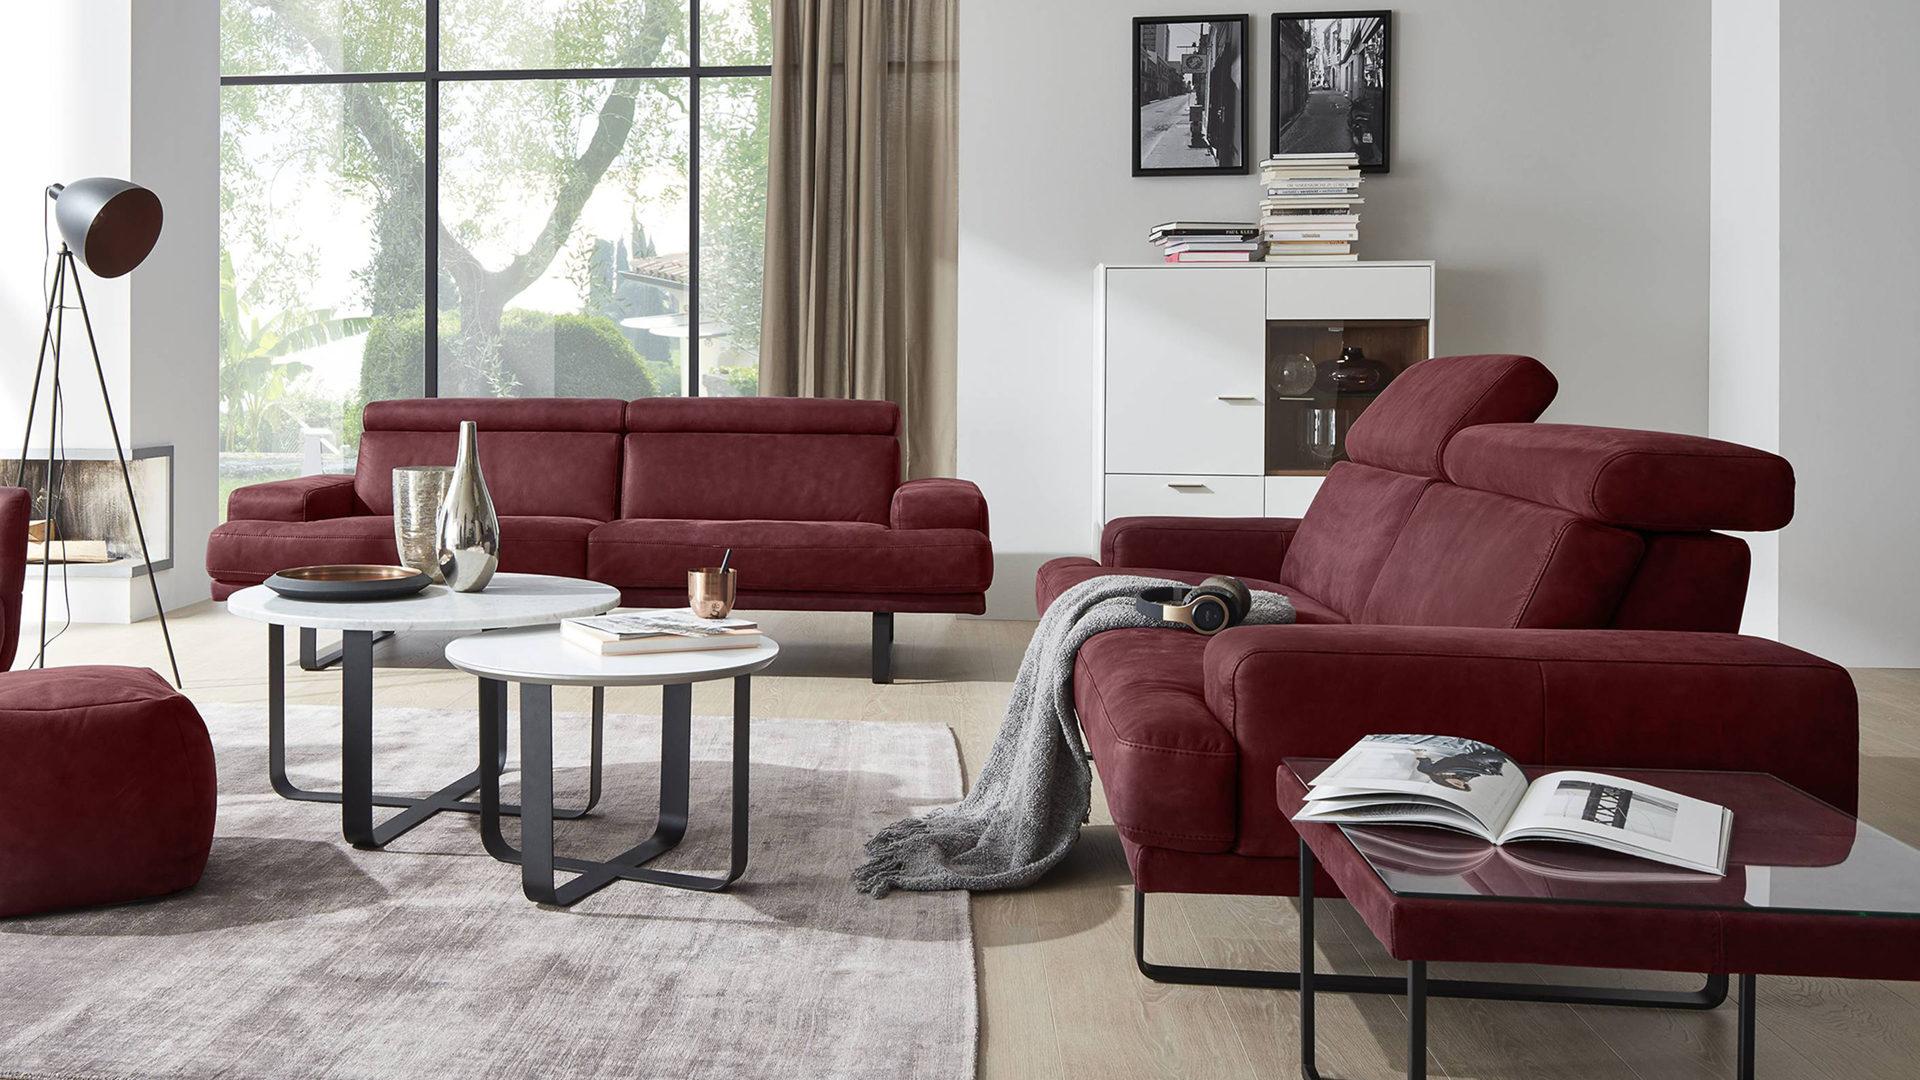 mobel bernskotter mulheim mobel a z sofas couches polstergarnituren interliving interliving sofa serie 4152 ledergarnitur dunkelrotes nubukleder